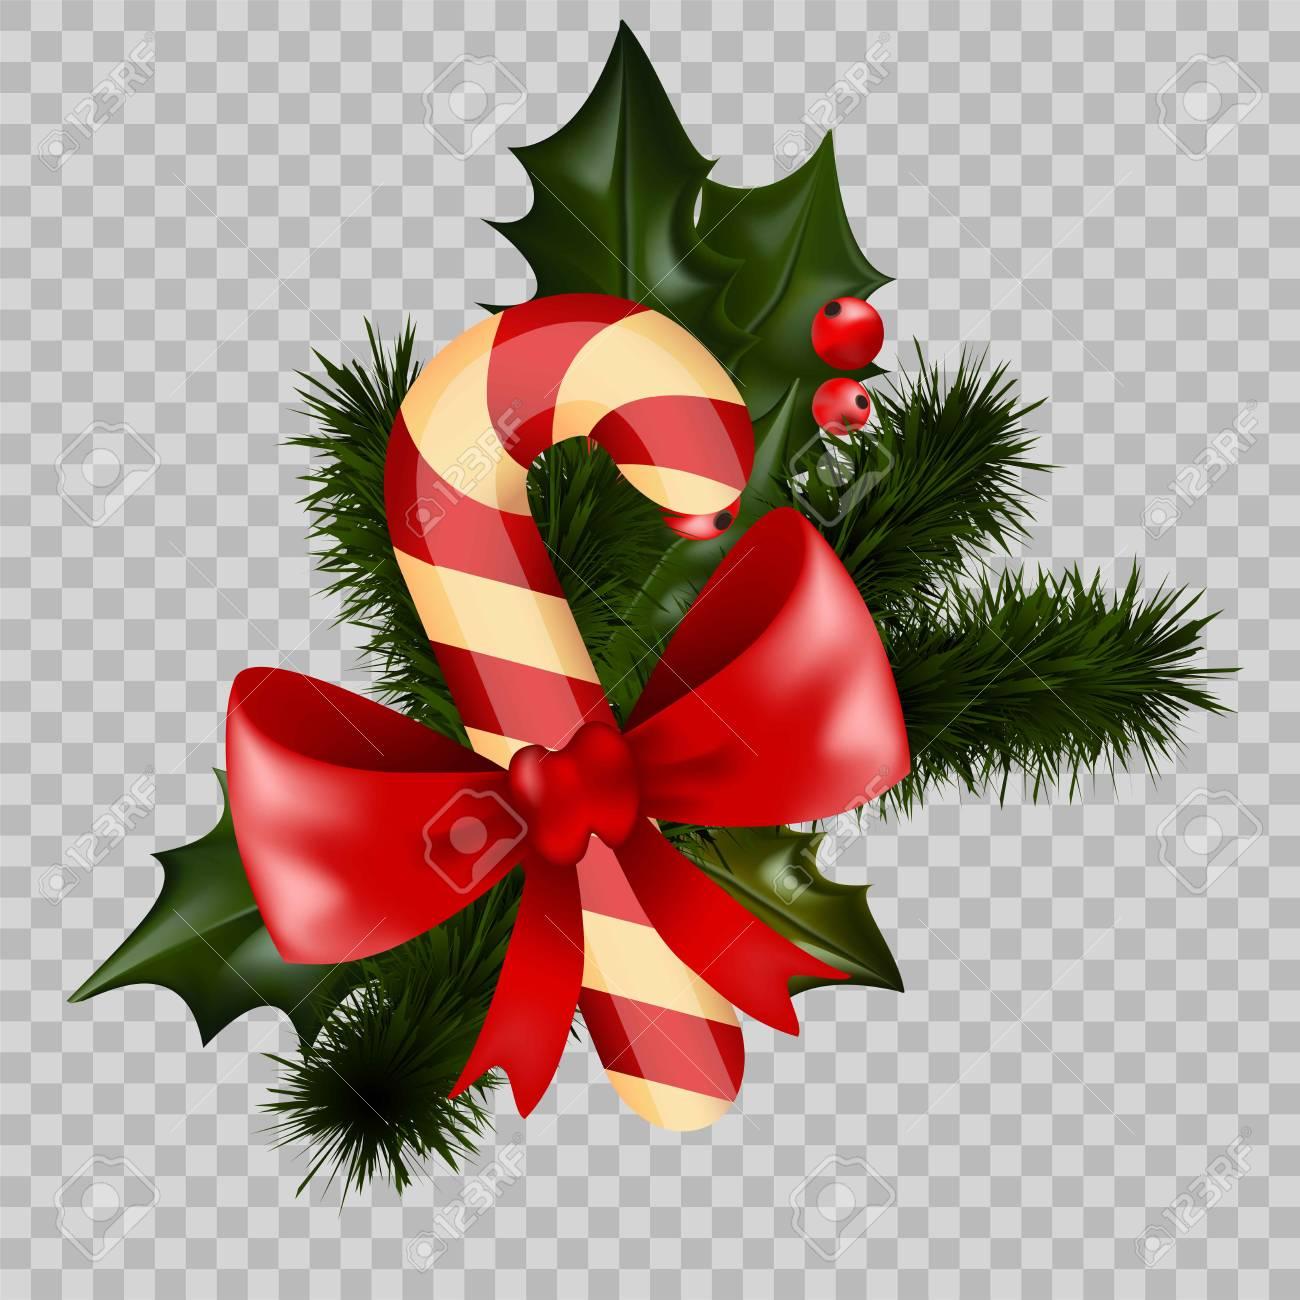 Christmas Decoration Holly Fir Wreath Bow Candy Cane Element